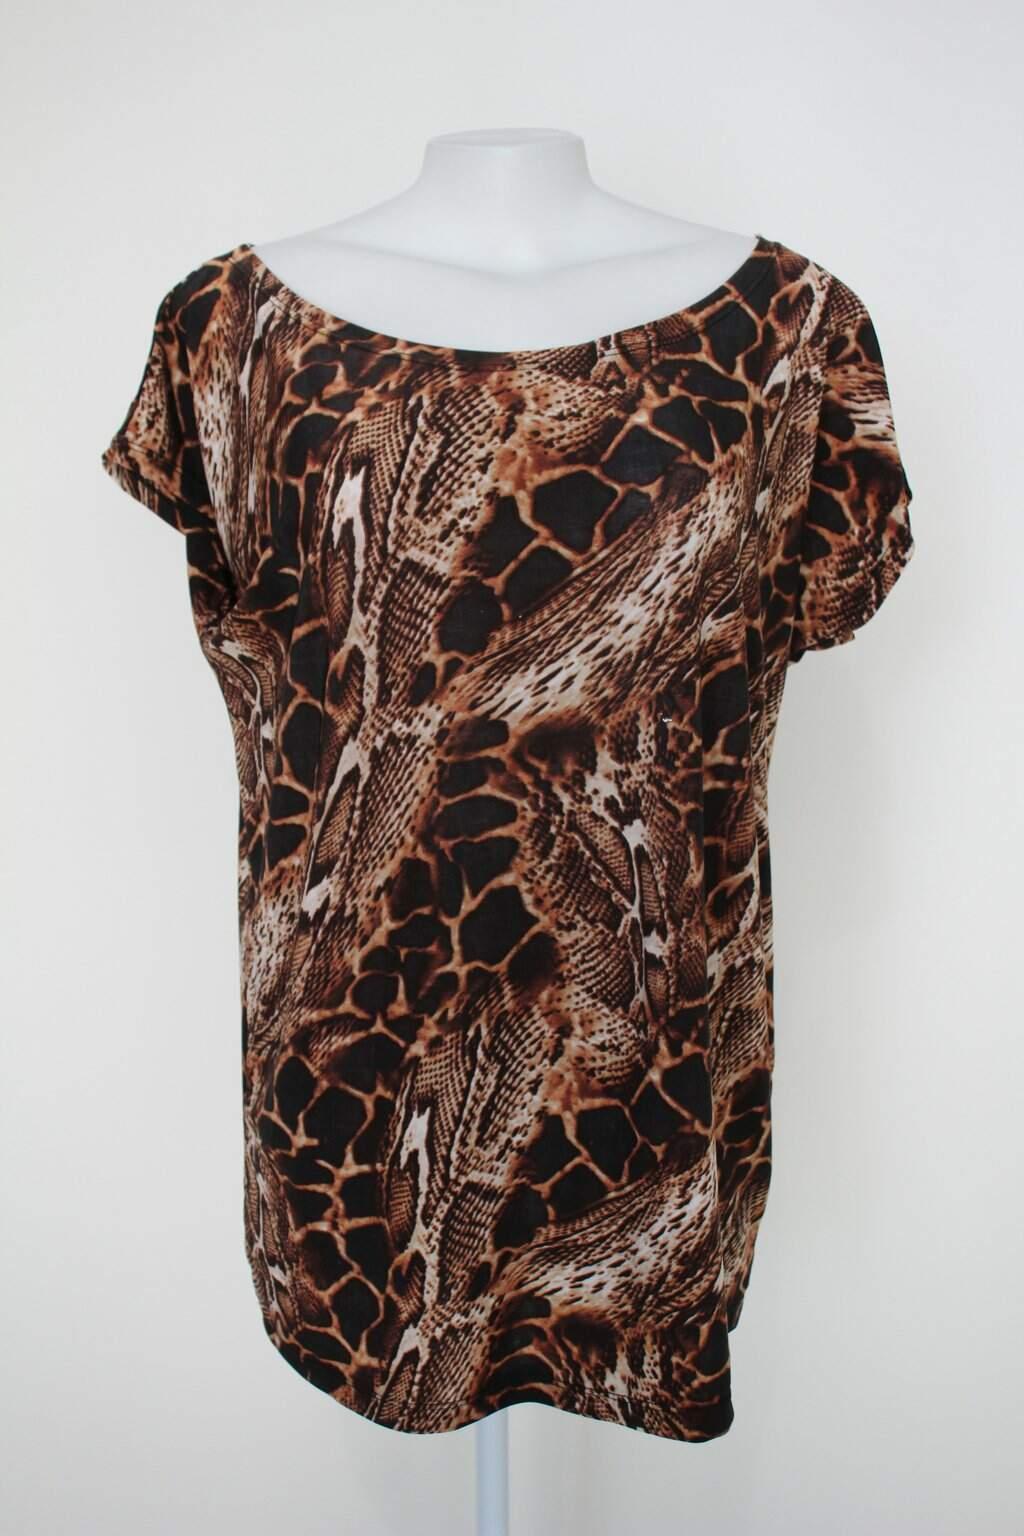 Blusa Feminina Estampada Animal Print